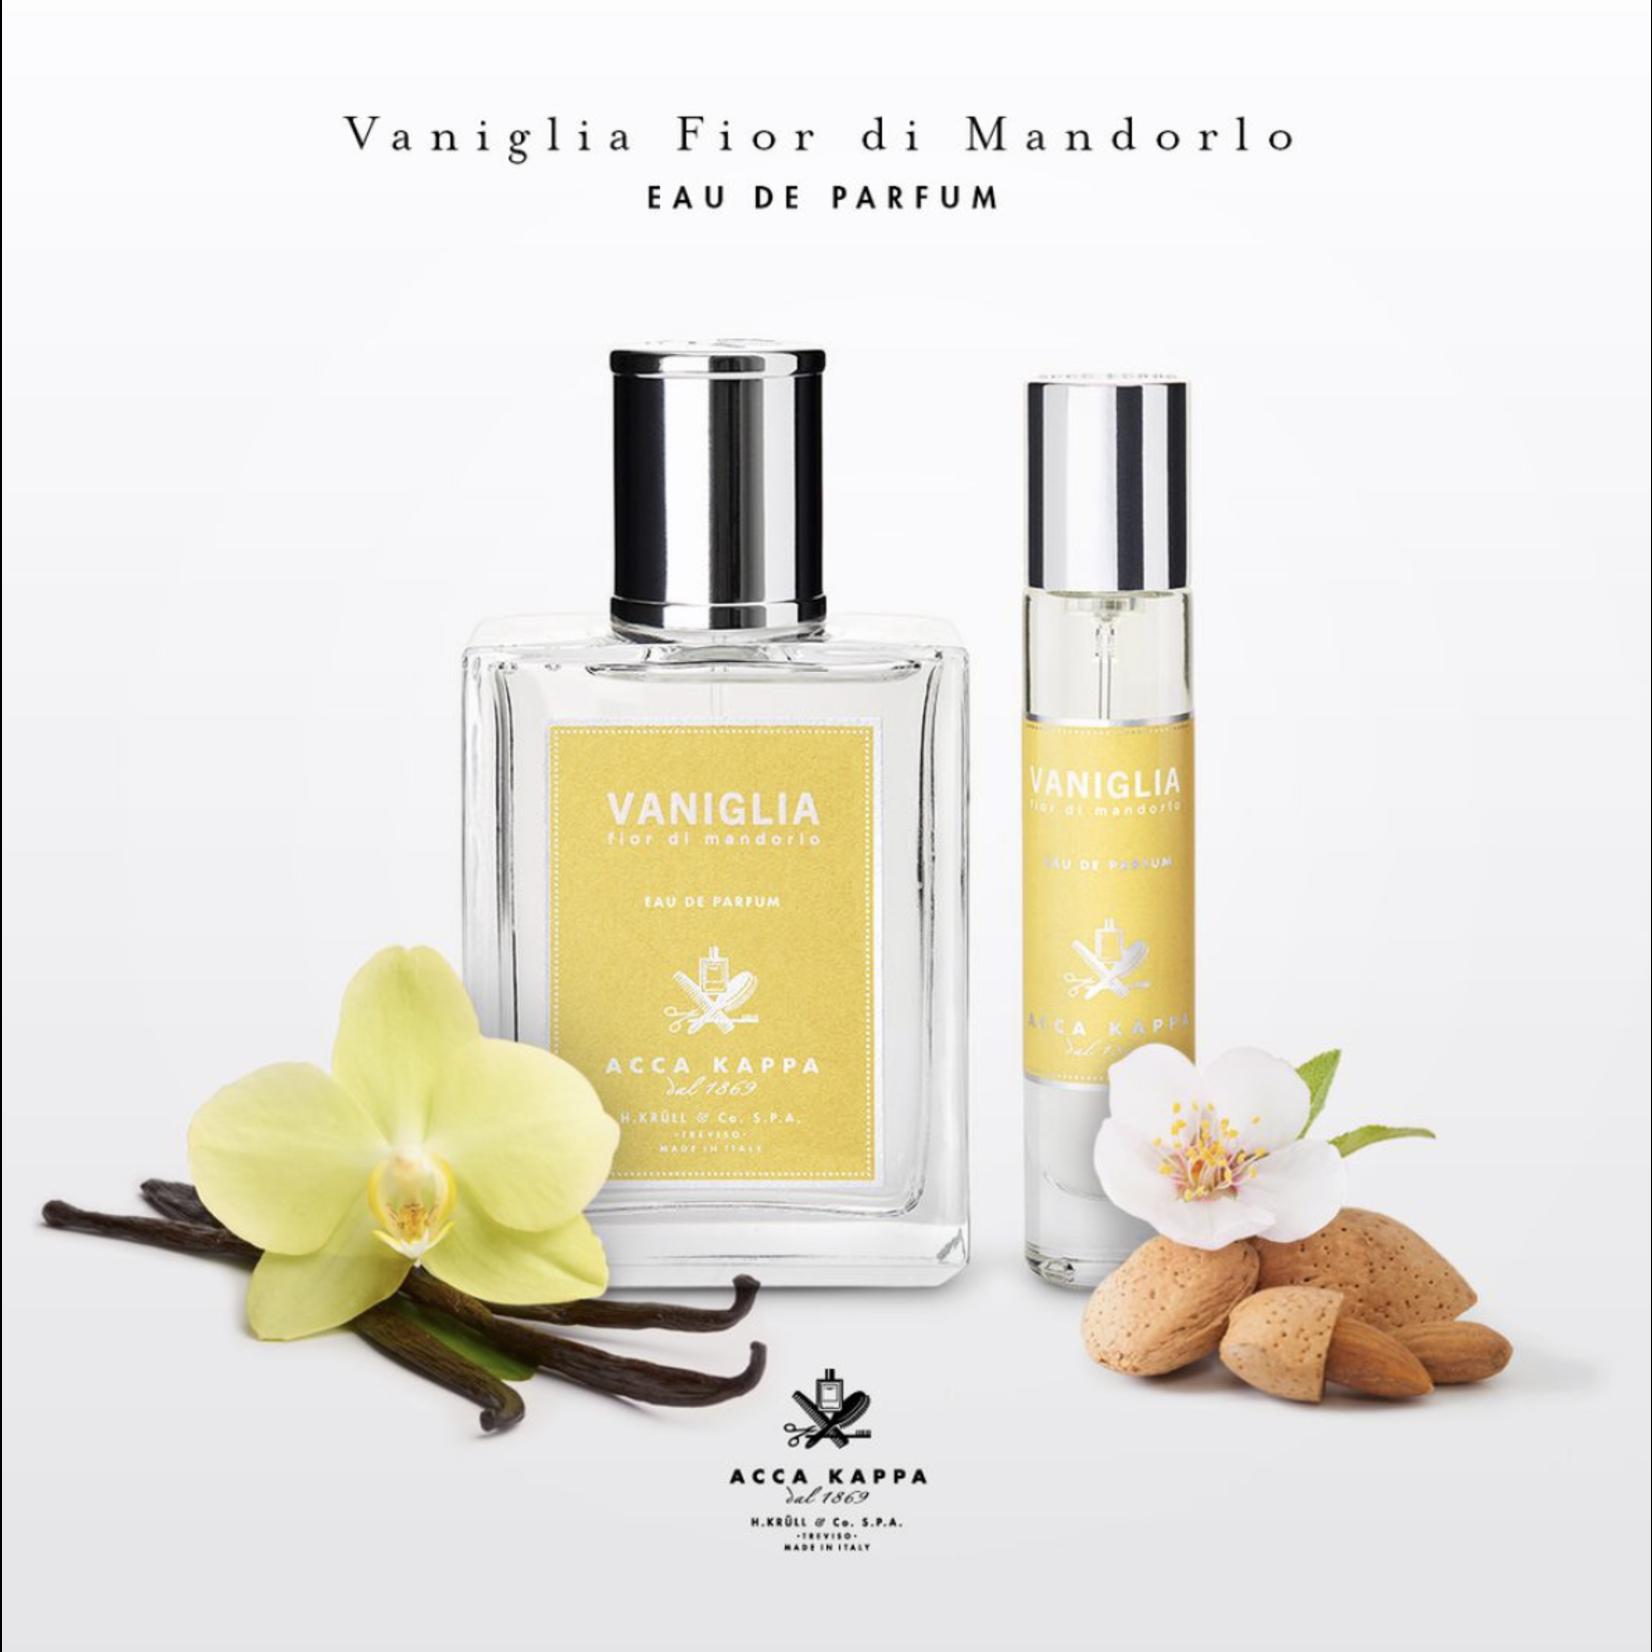 ACCA KAPPA ACCA KAPPA · VANIGLIA & FIOR DI MANDORLA 50ML